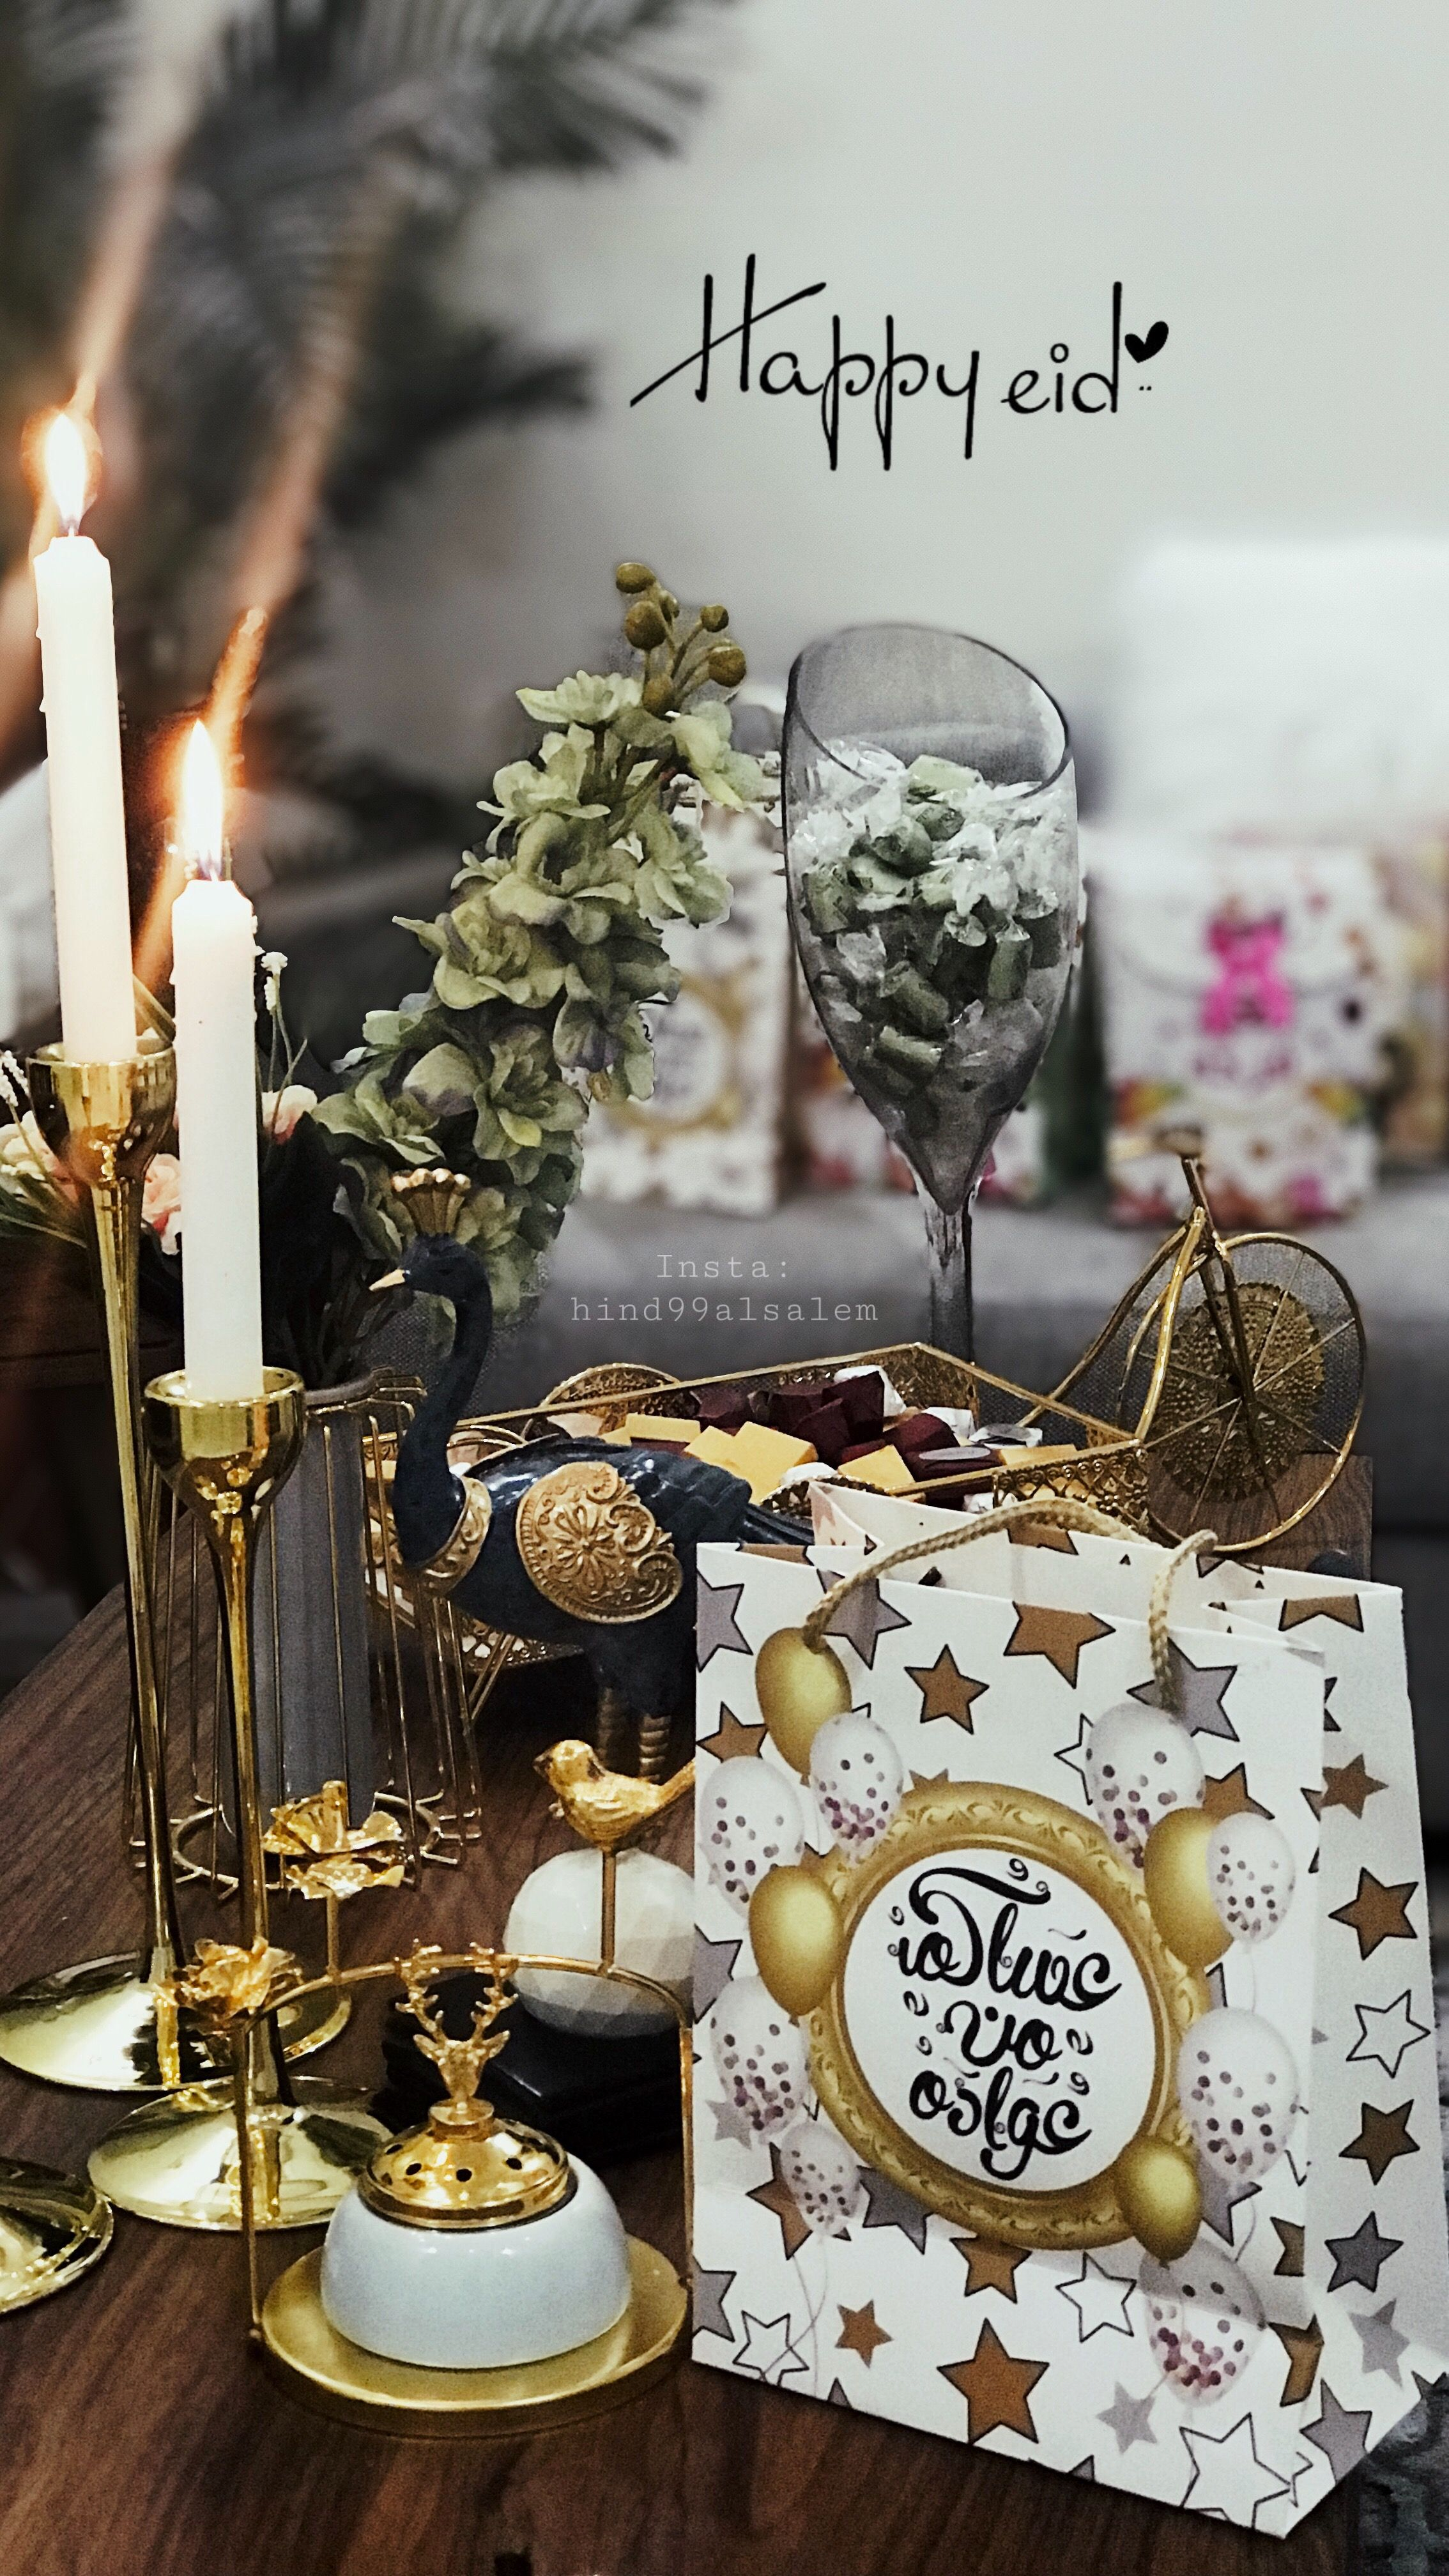 عساكم من عواده Ramadan Decorations Eid Mubarak Card Eid